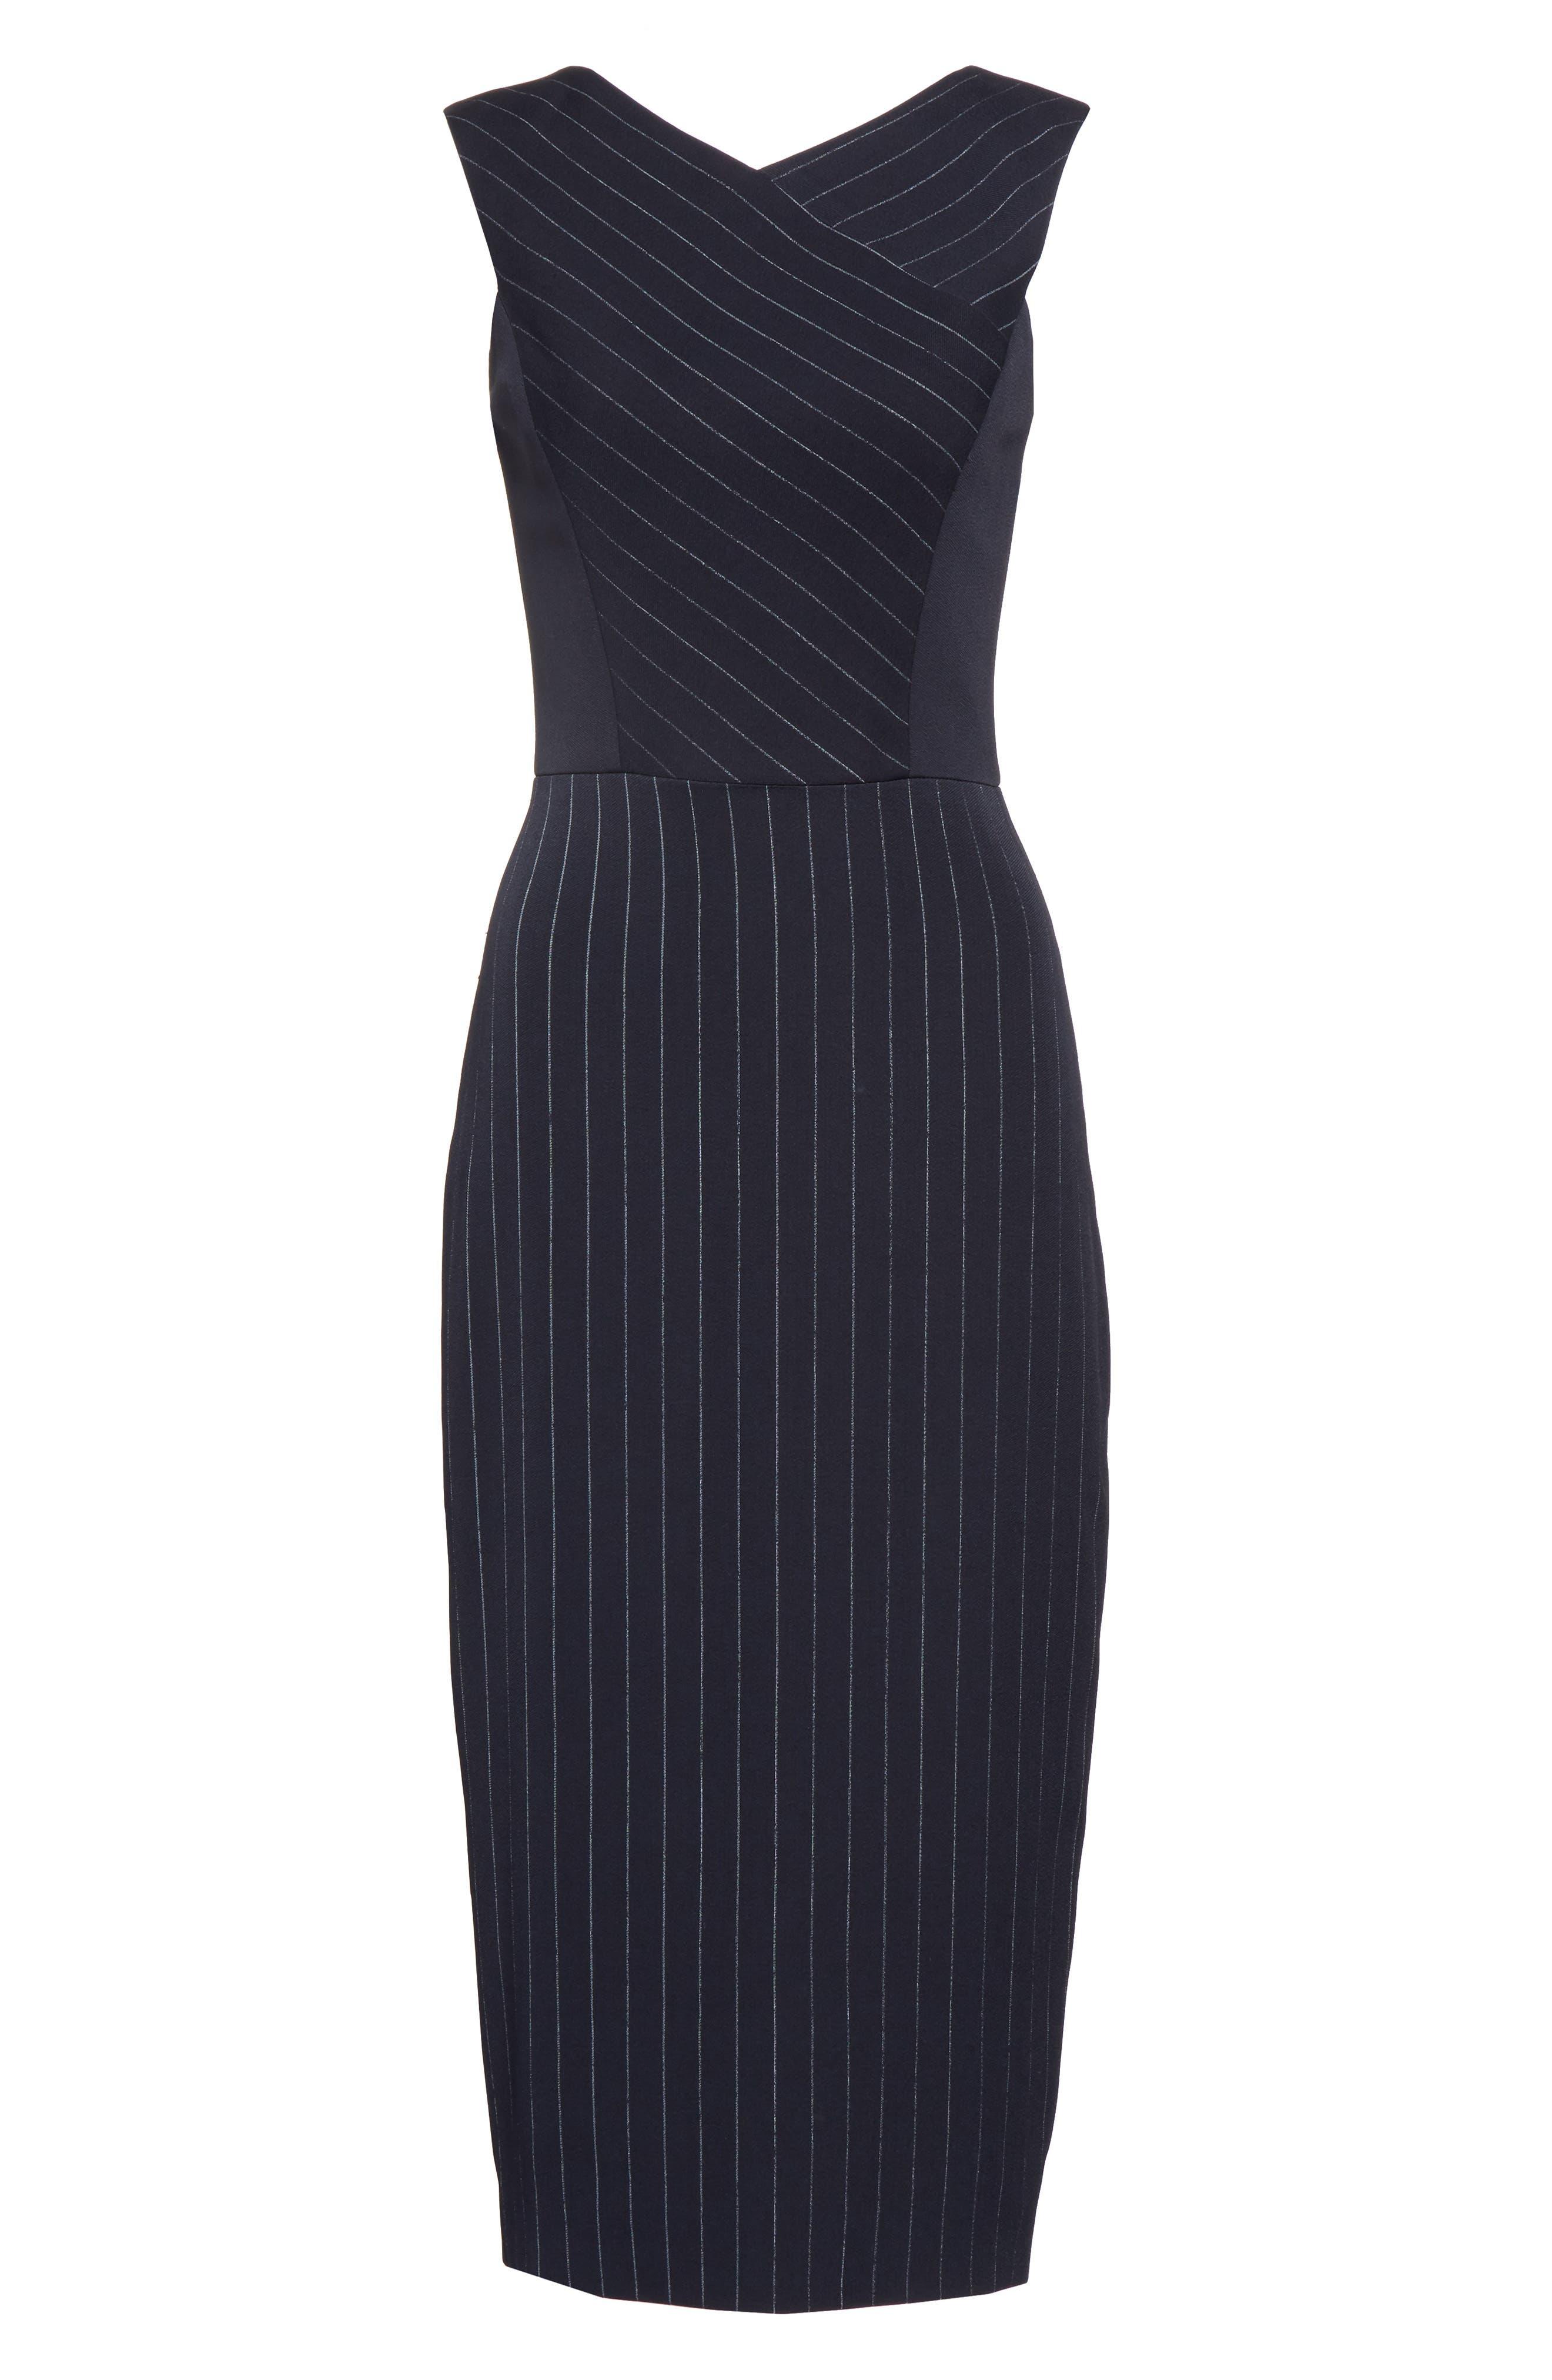 Pinstripe Stretch Dress,                             Alternate thumbnail 4, color,                             Black/ Chalk